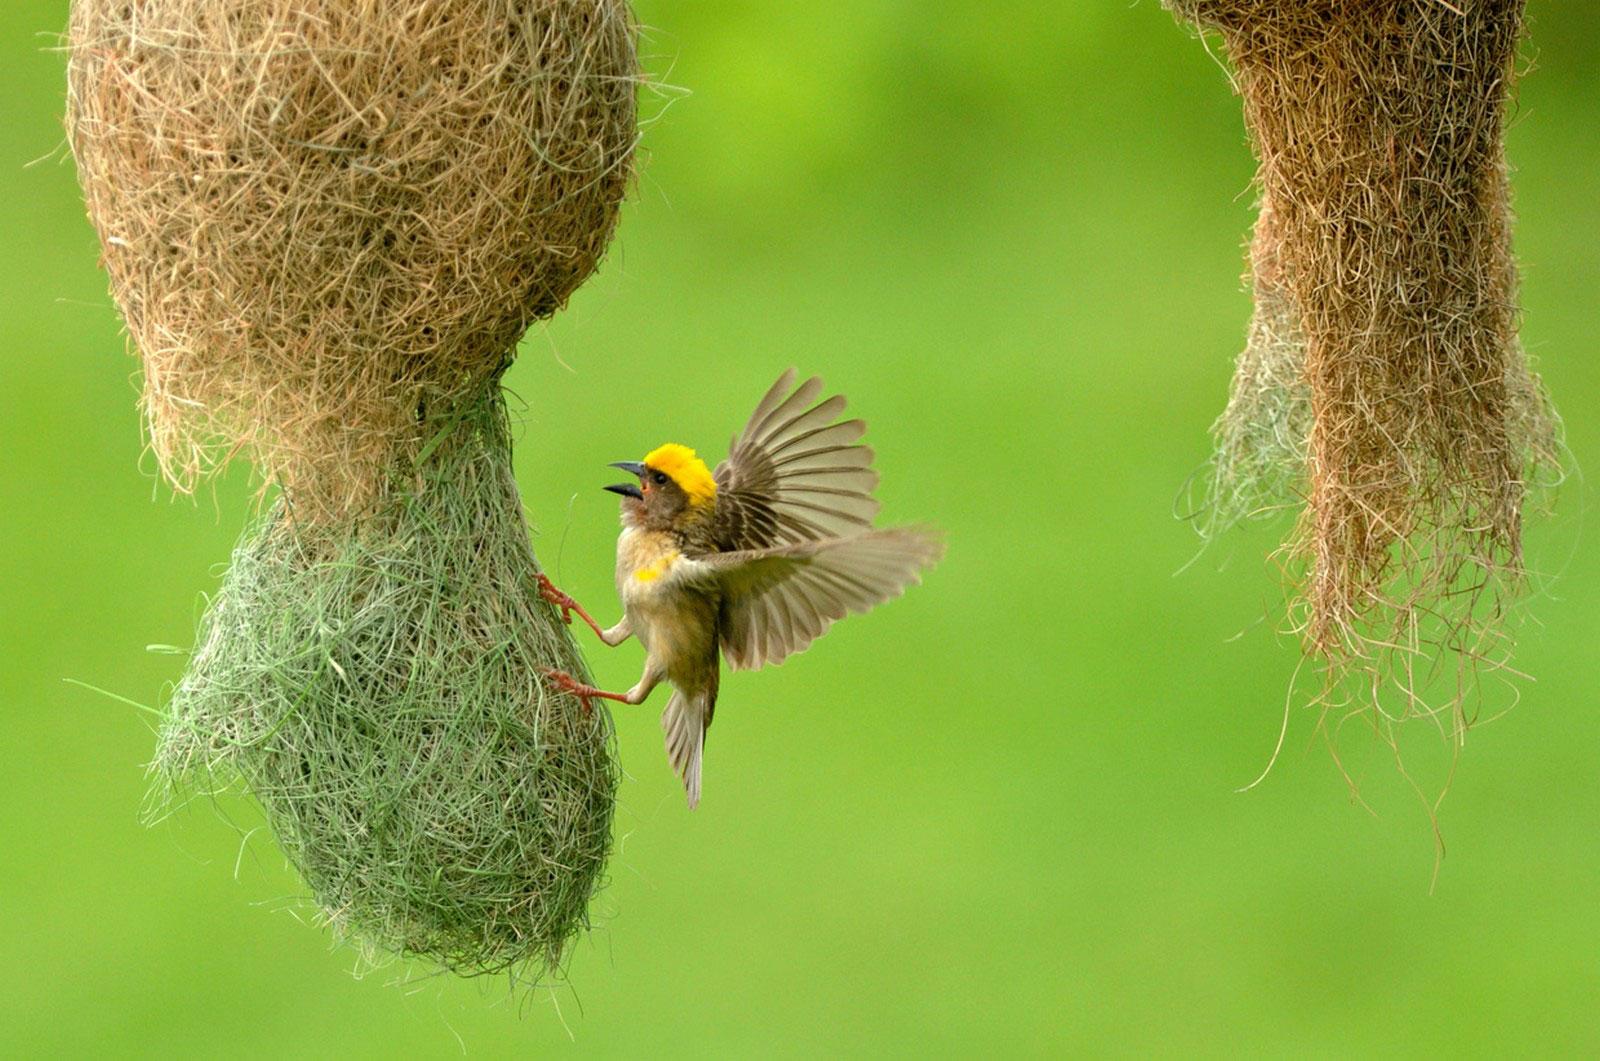 ткач вьет гнездо